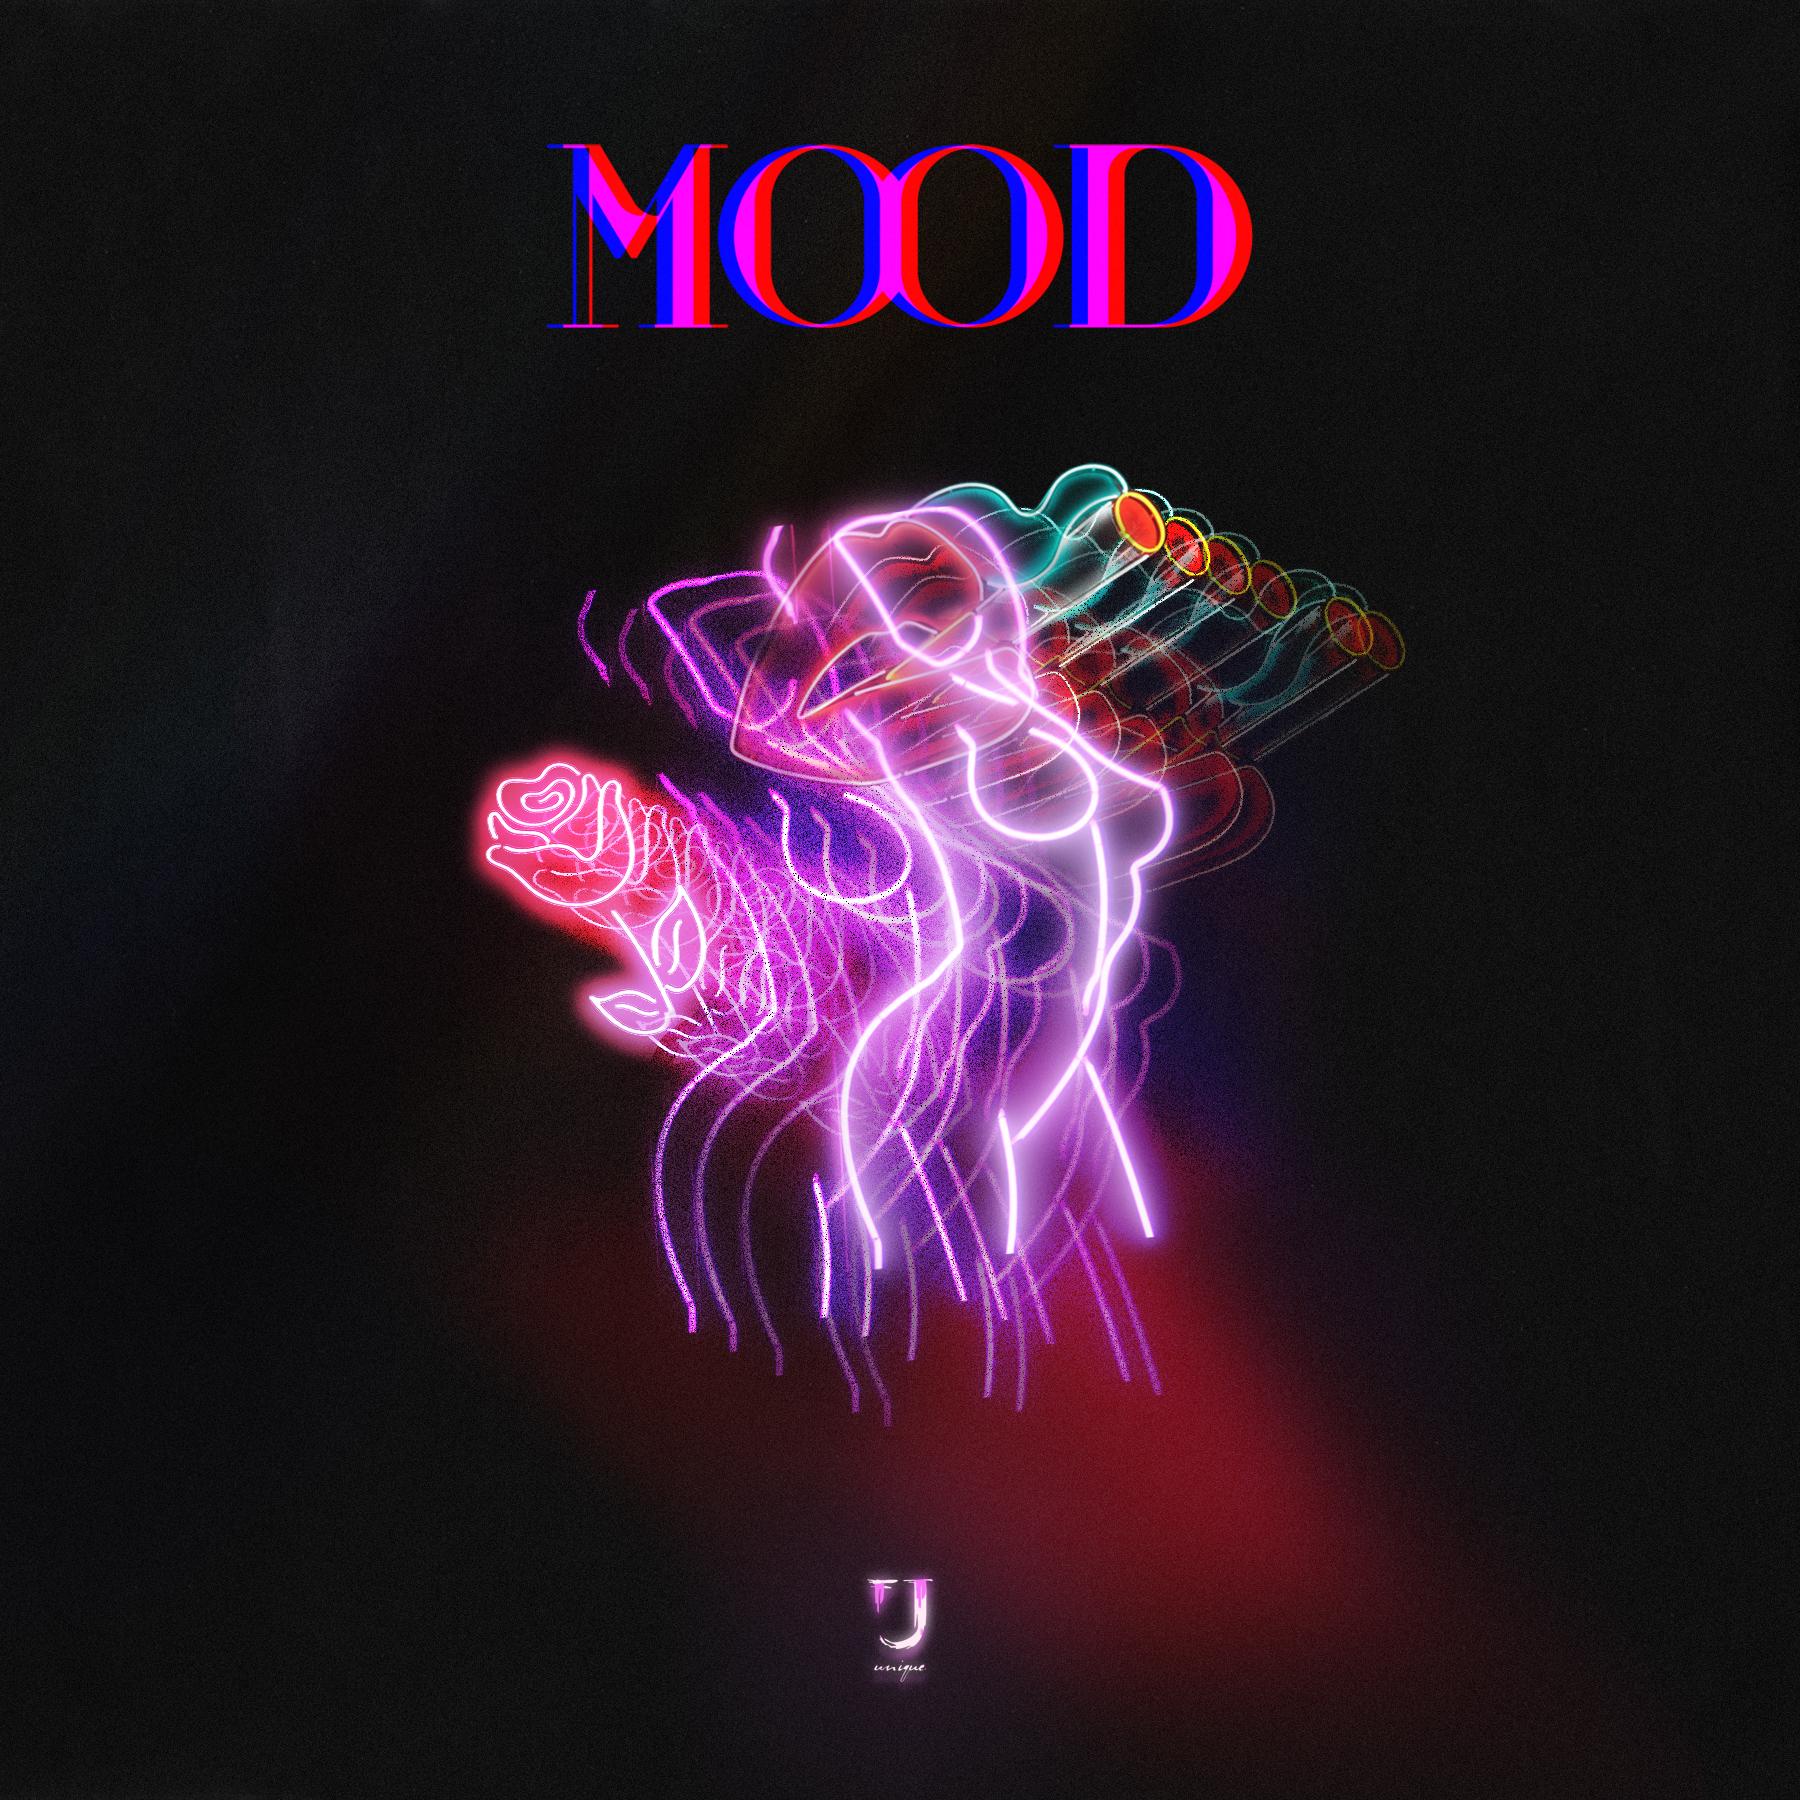 Mood 3.JPG